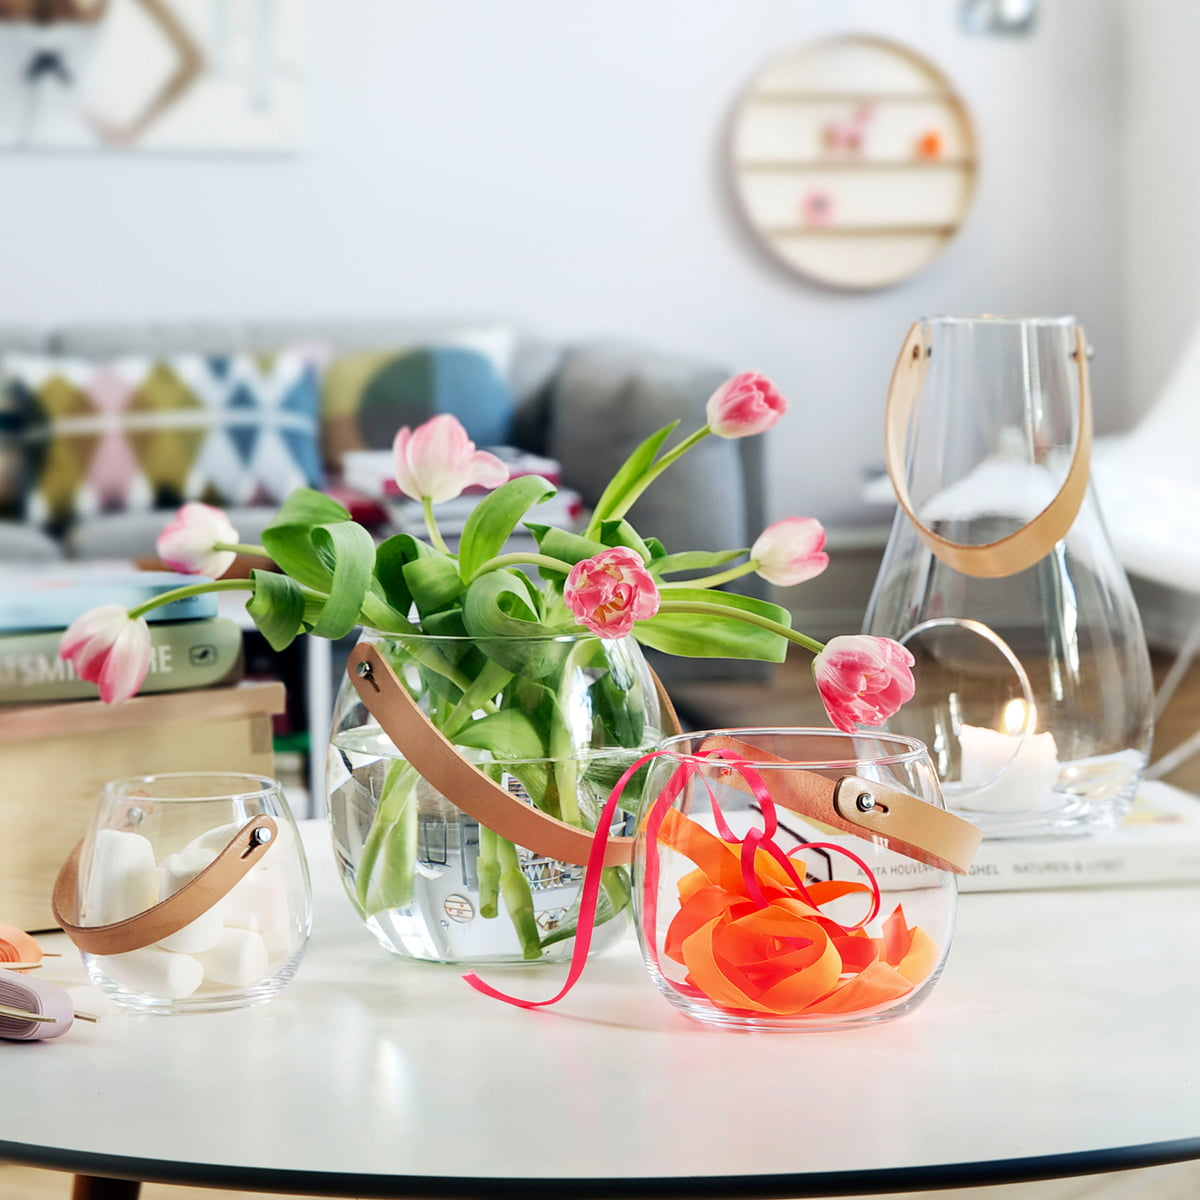 holmegaard design with light Design with Light glass bowl by Holmegaard holmegaard design with light